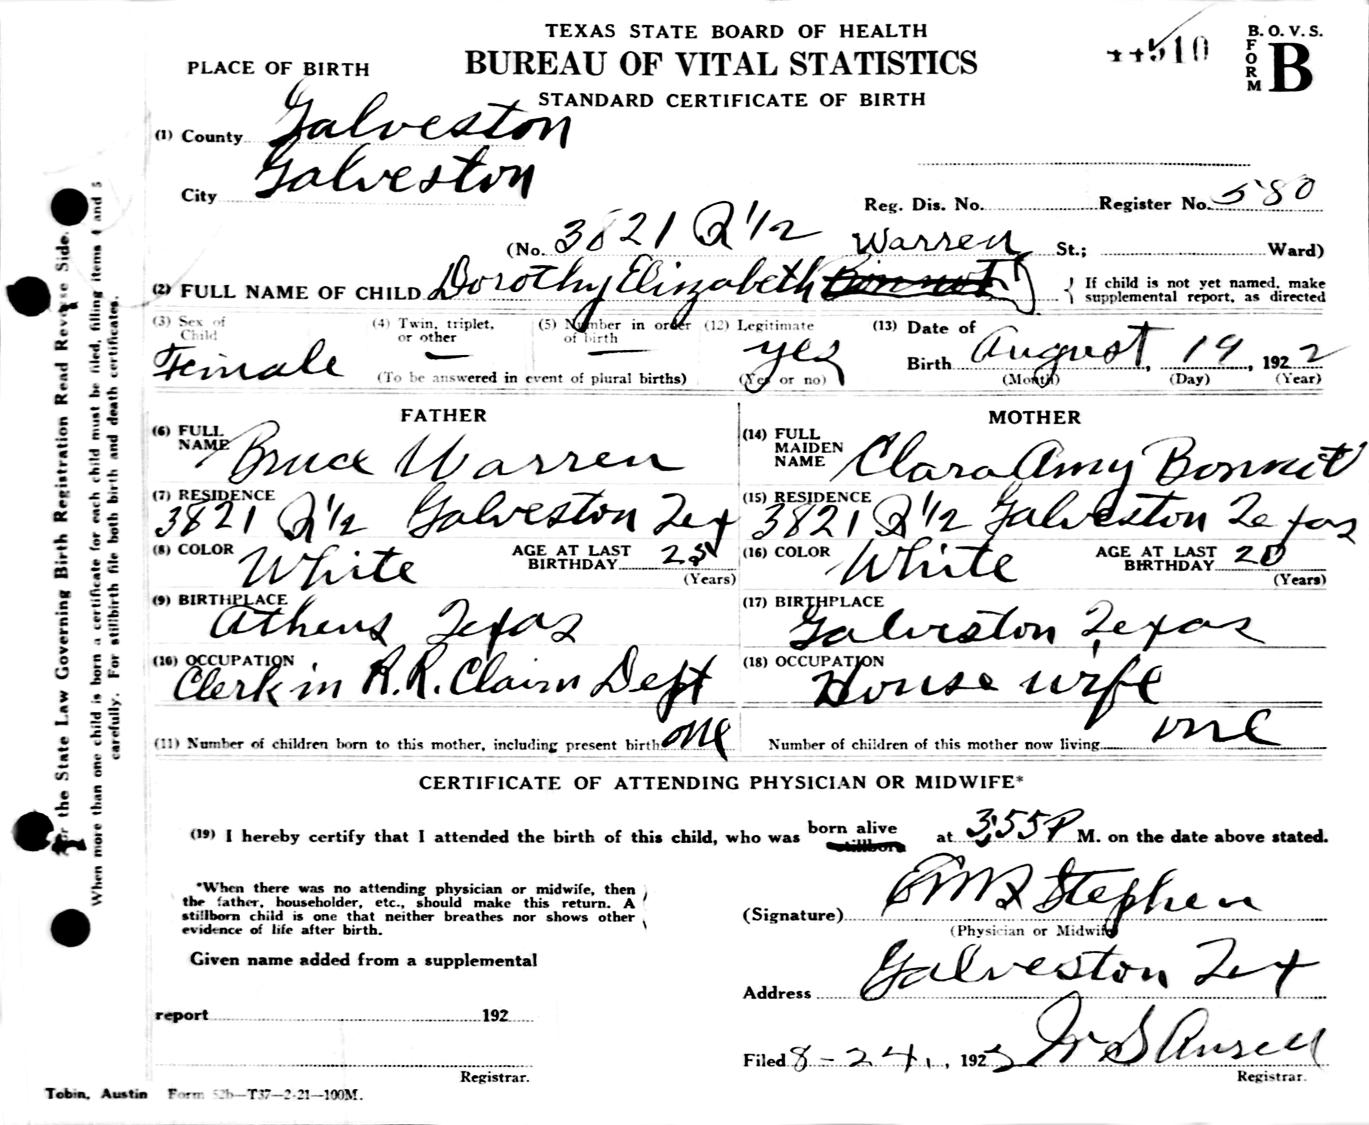 Robert alfred chapman dorothy elizabeth dot warren birth certificate aiddatafo Image collections